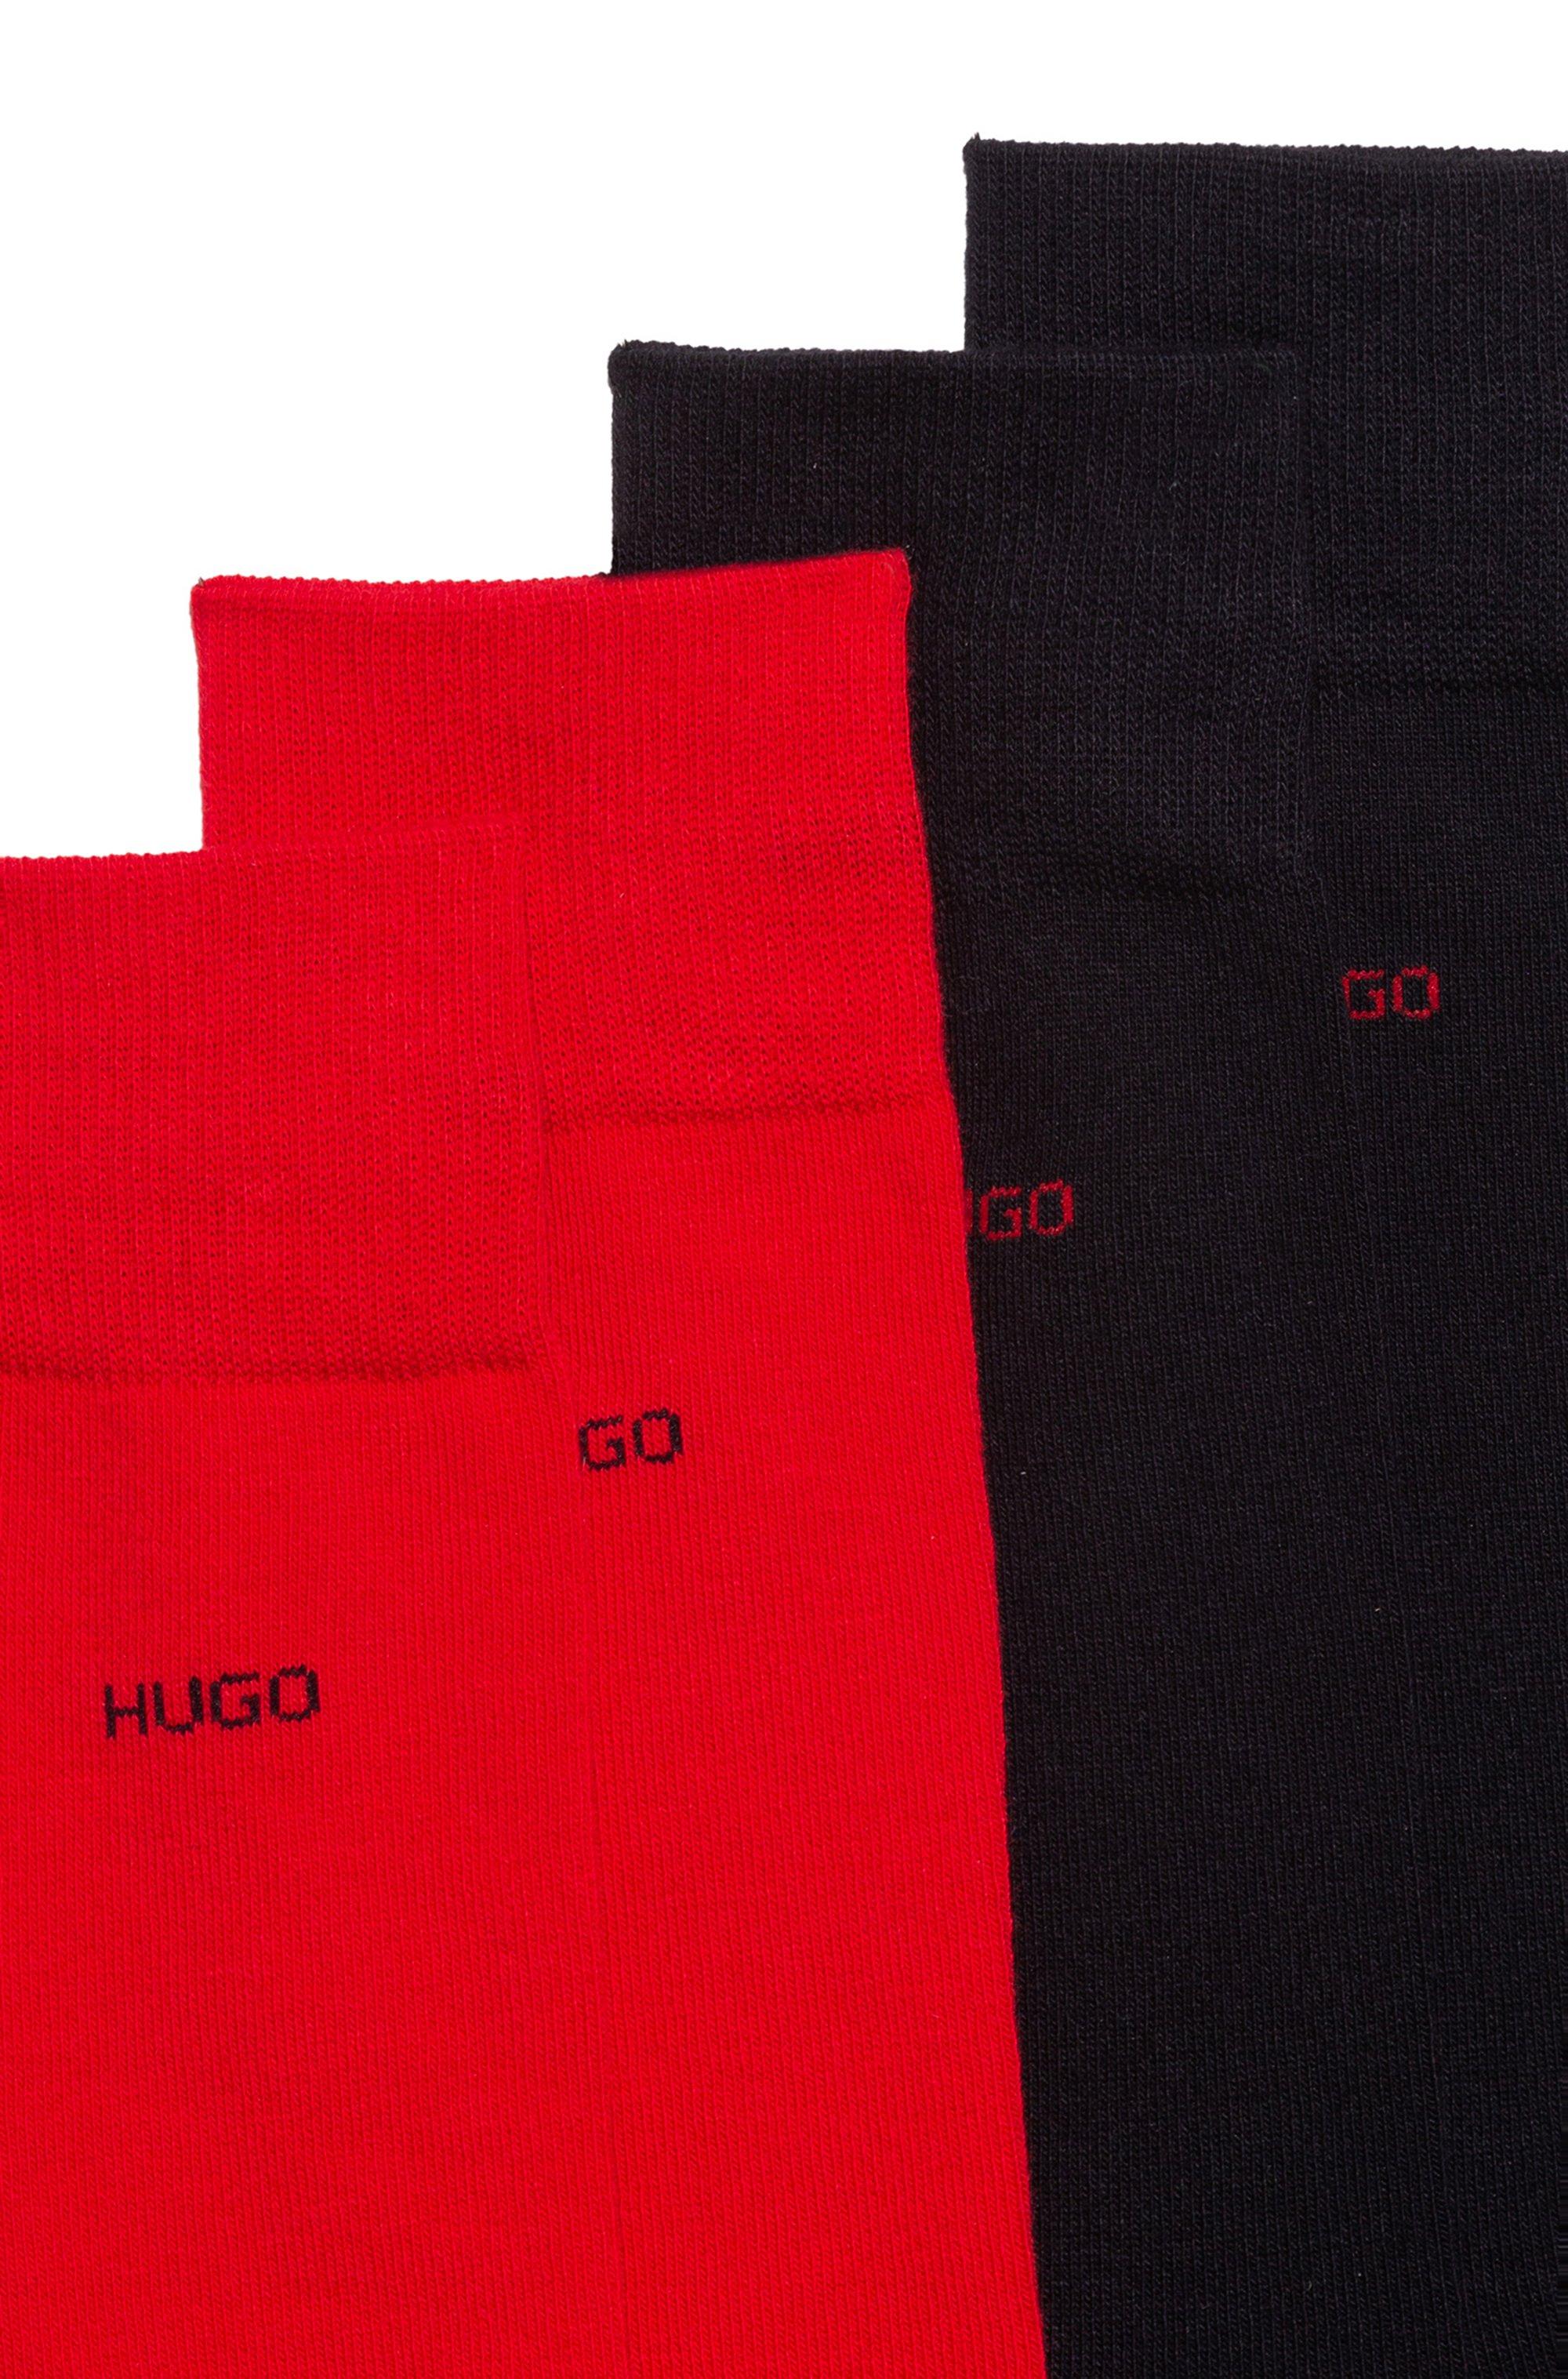 Mittelhohe Socken aus Baumwoll-Mix im Zweier-Pack